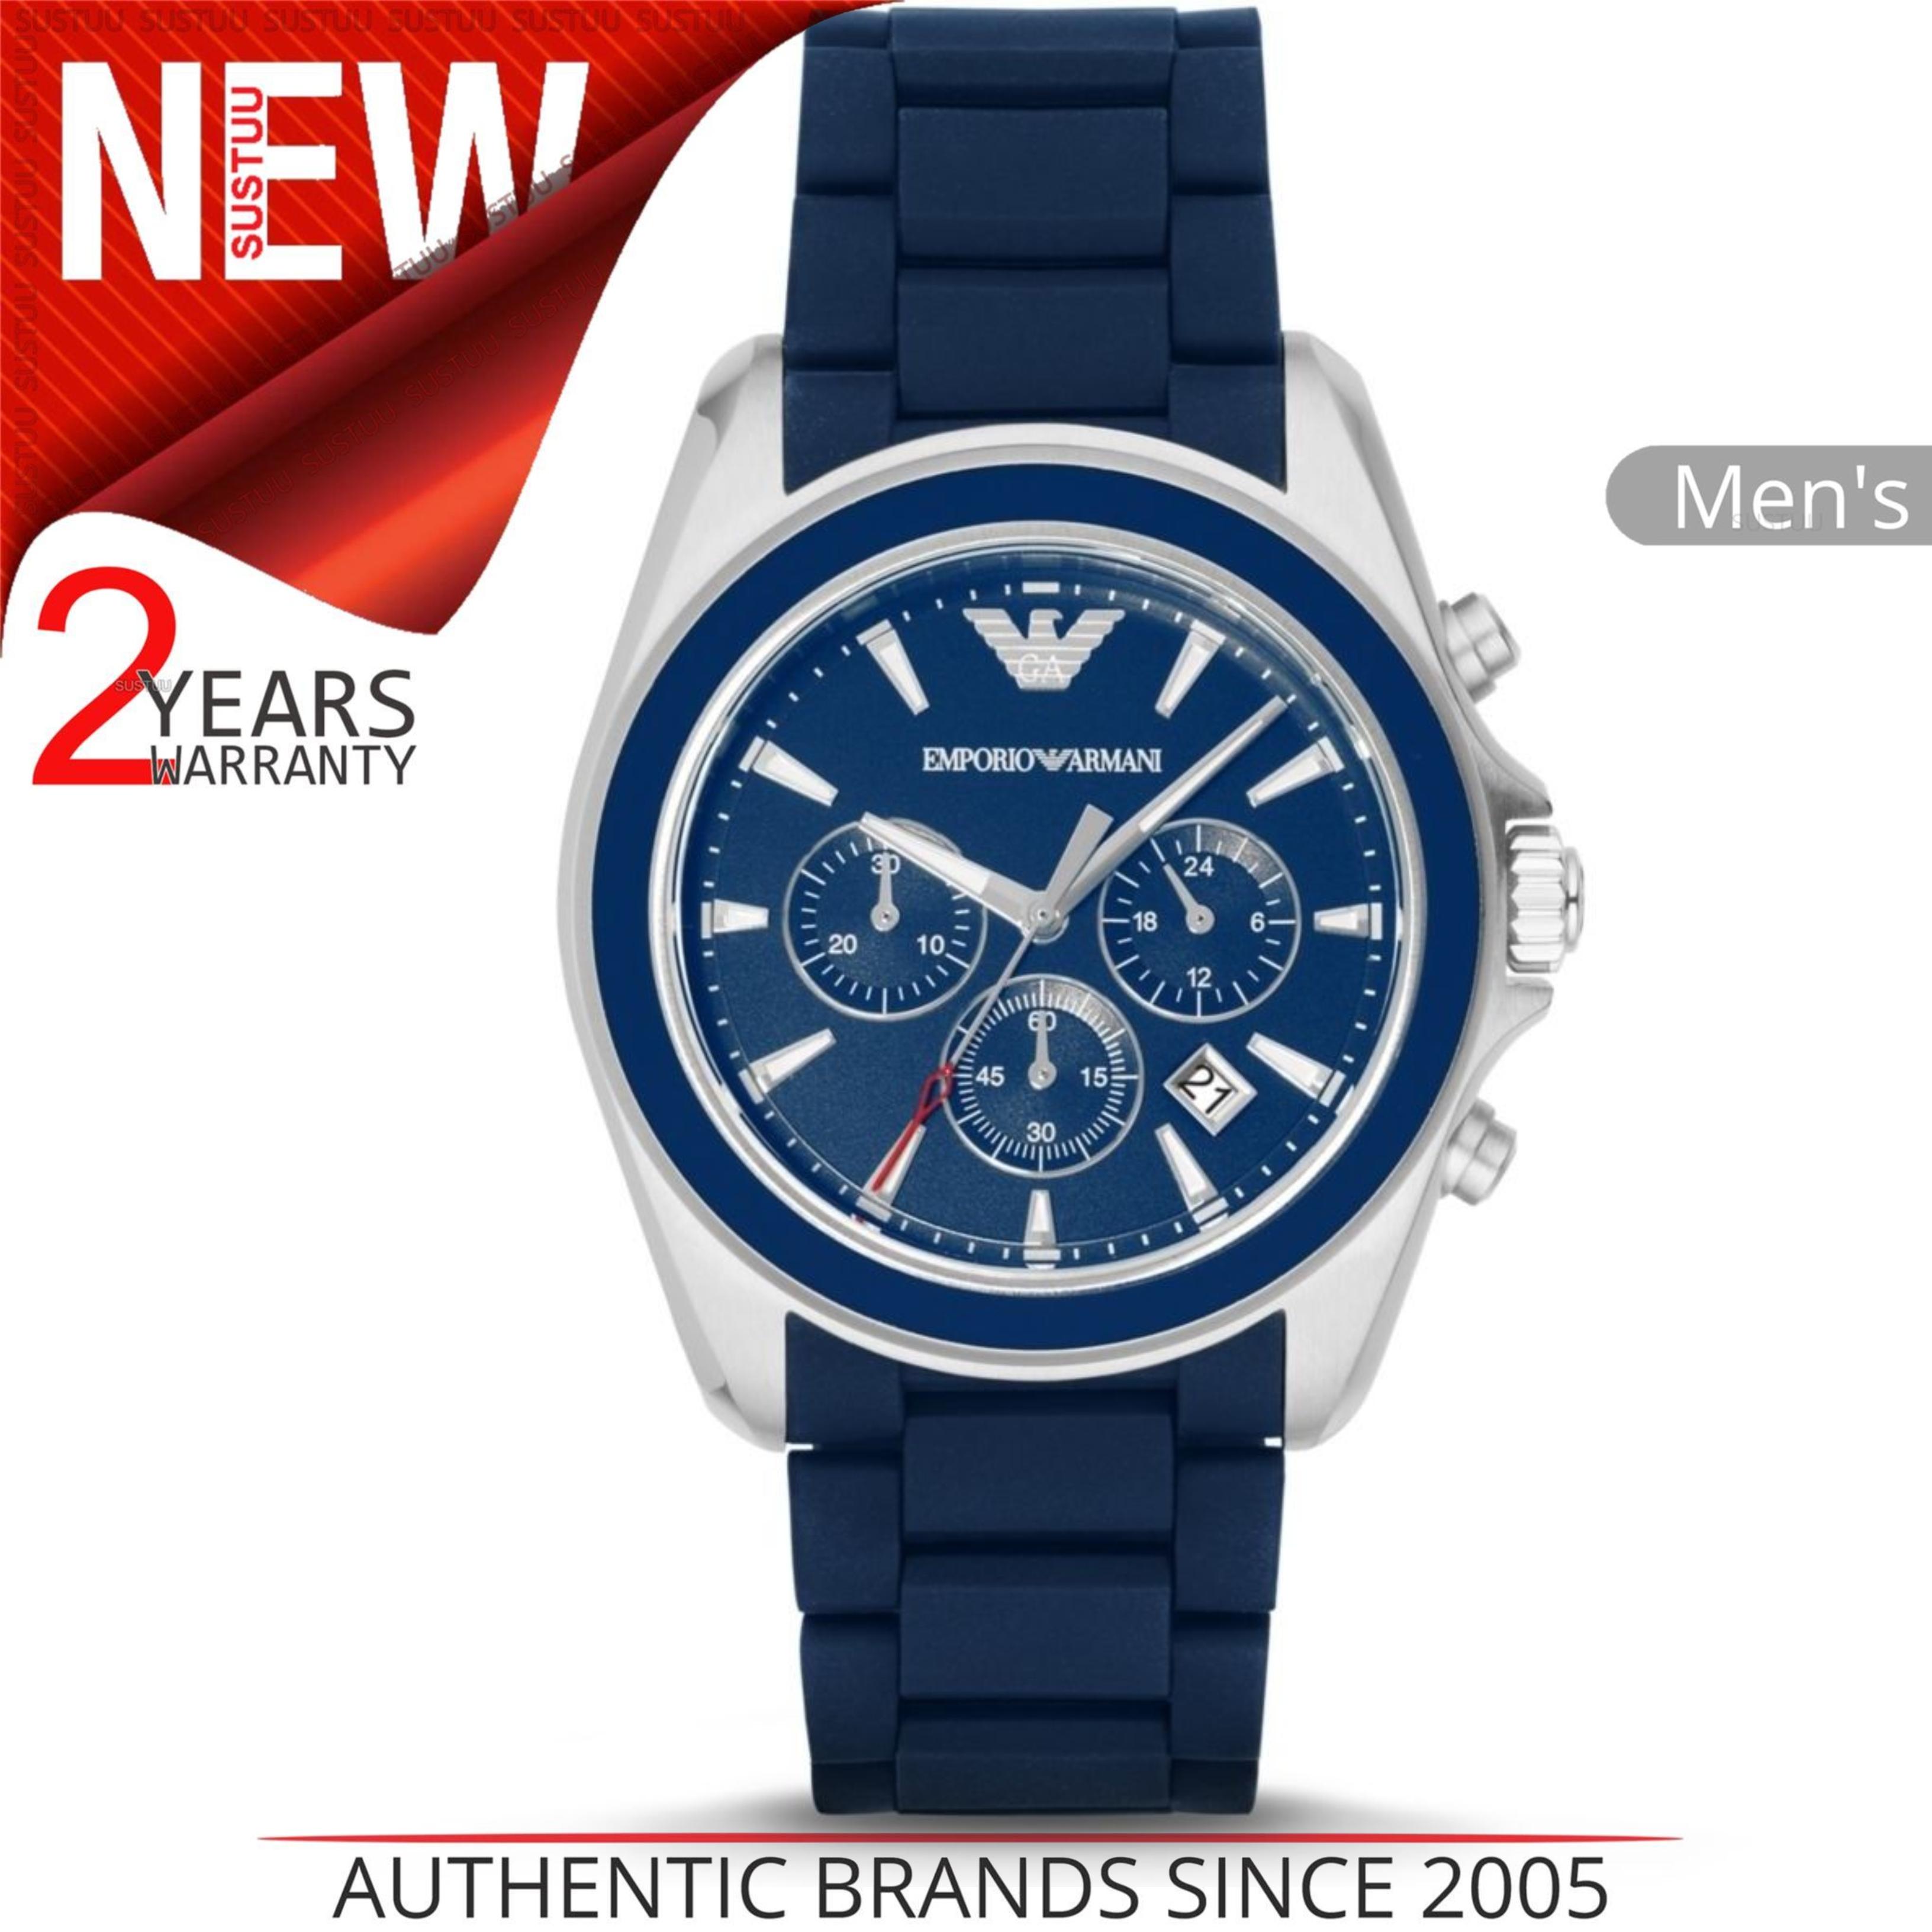 91864e714f5d CENTINELA Reloj Emporio Armani Sportivo para hombre AR6068│ Cronógrafo con  esfera azul ub Correa de caucho